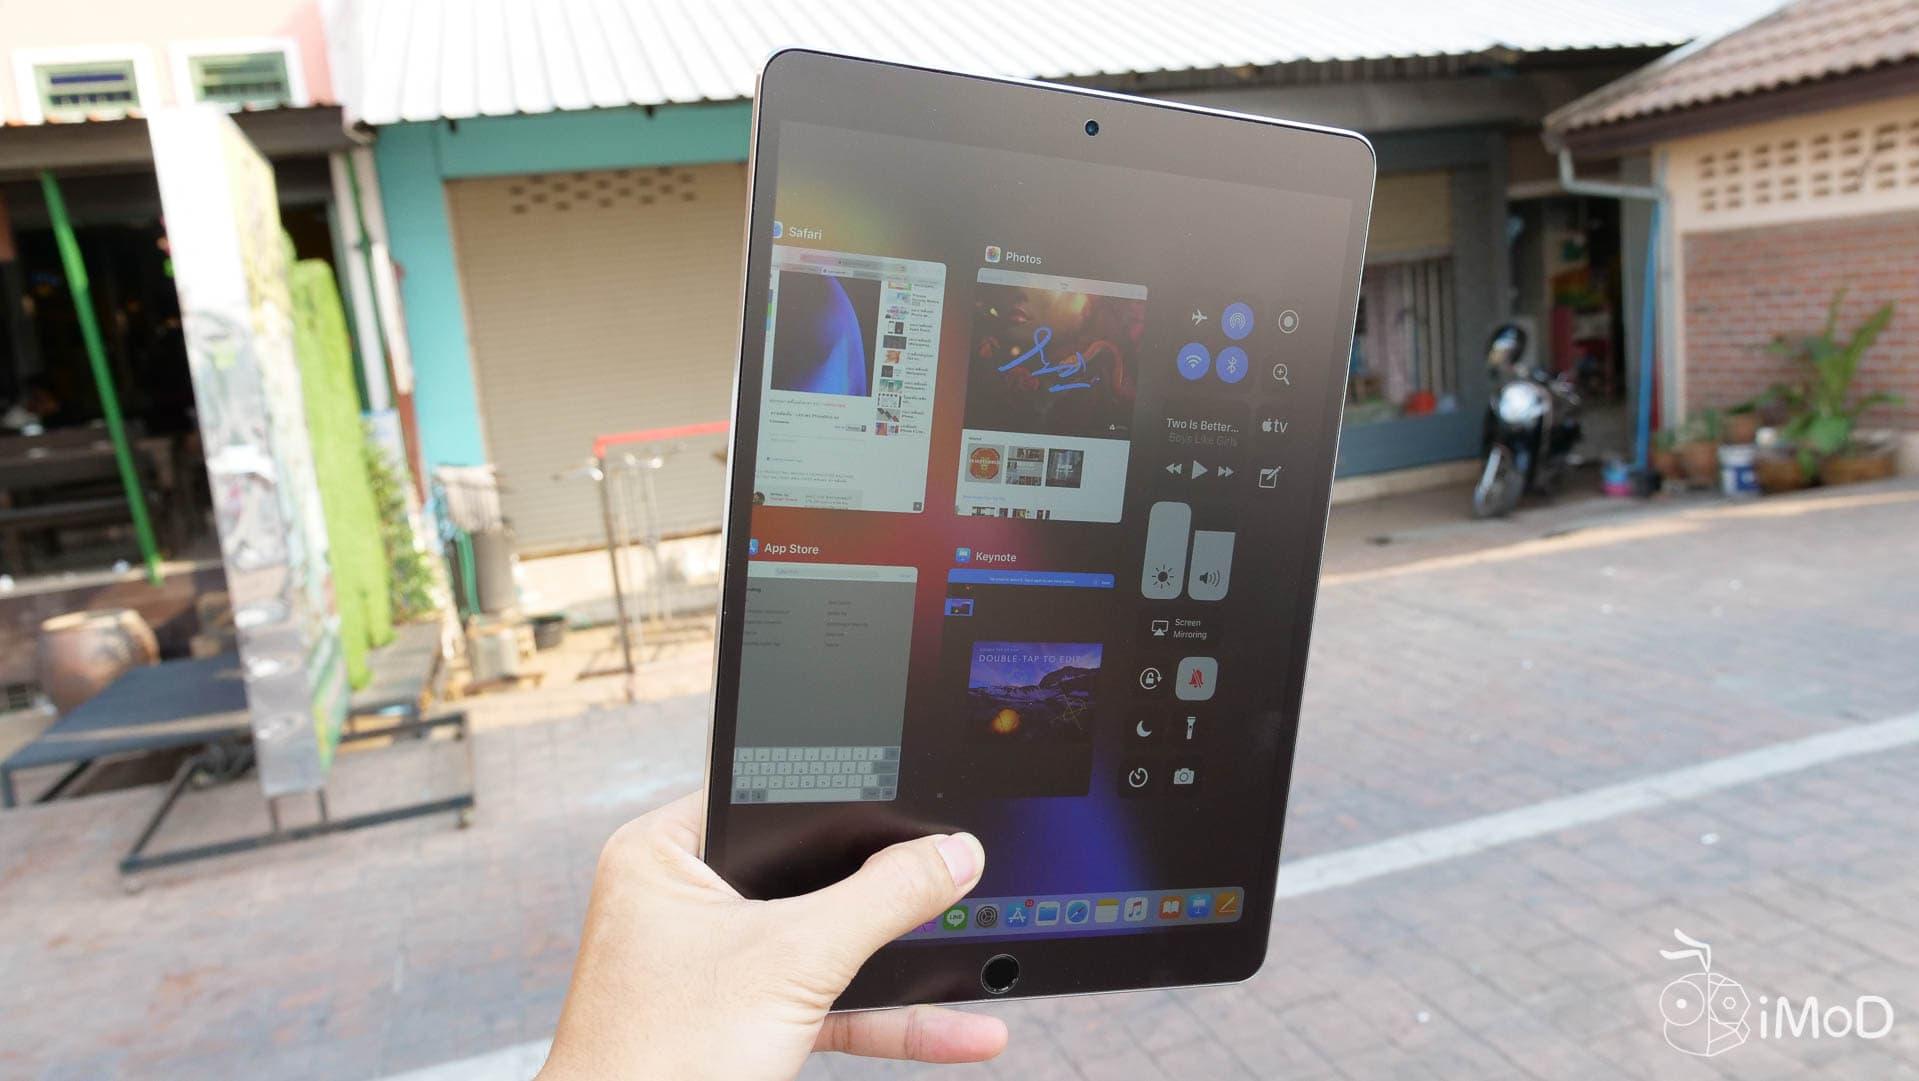 Focus Ipad Pro 10.5 Smart Note 2591